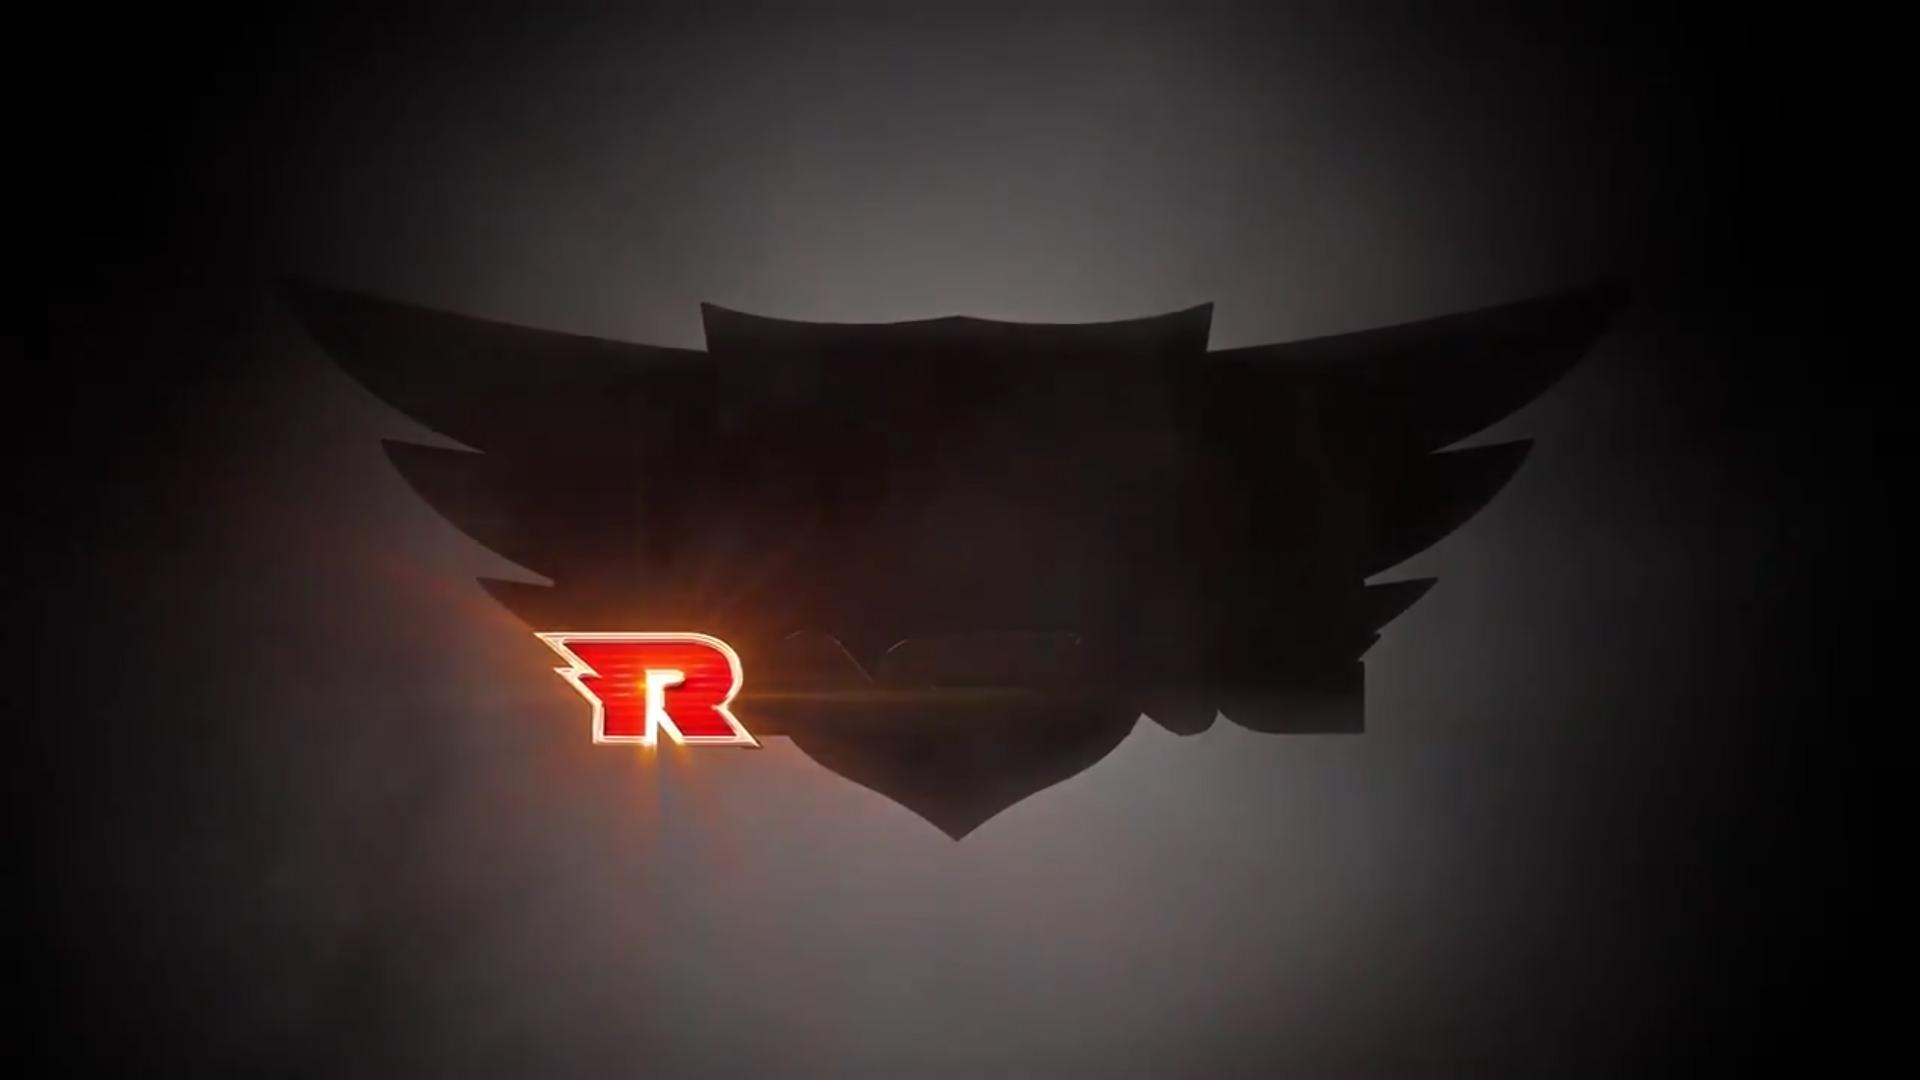 New Sonic racing game teaser trailer released on social media